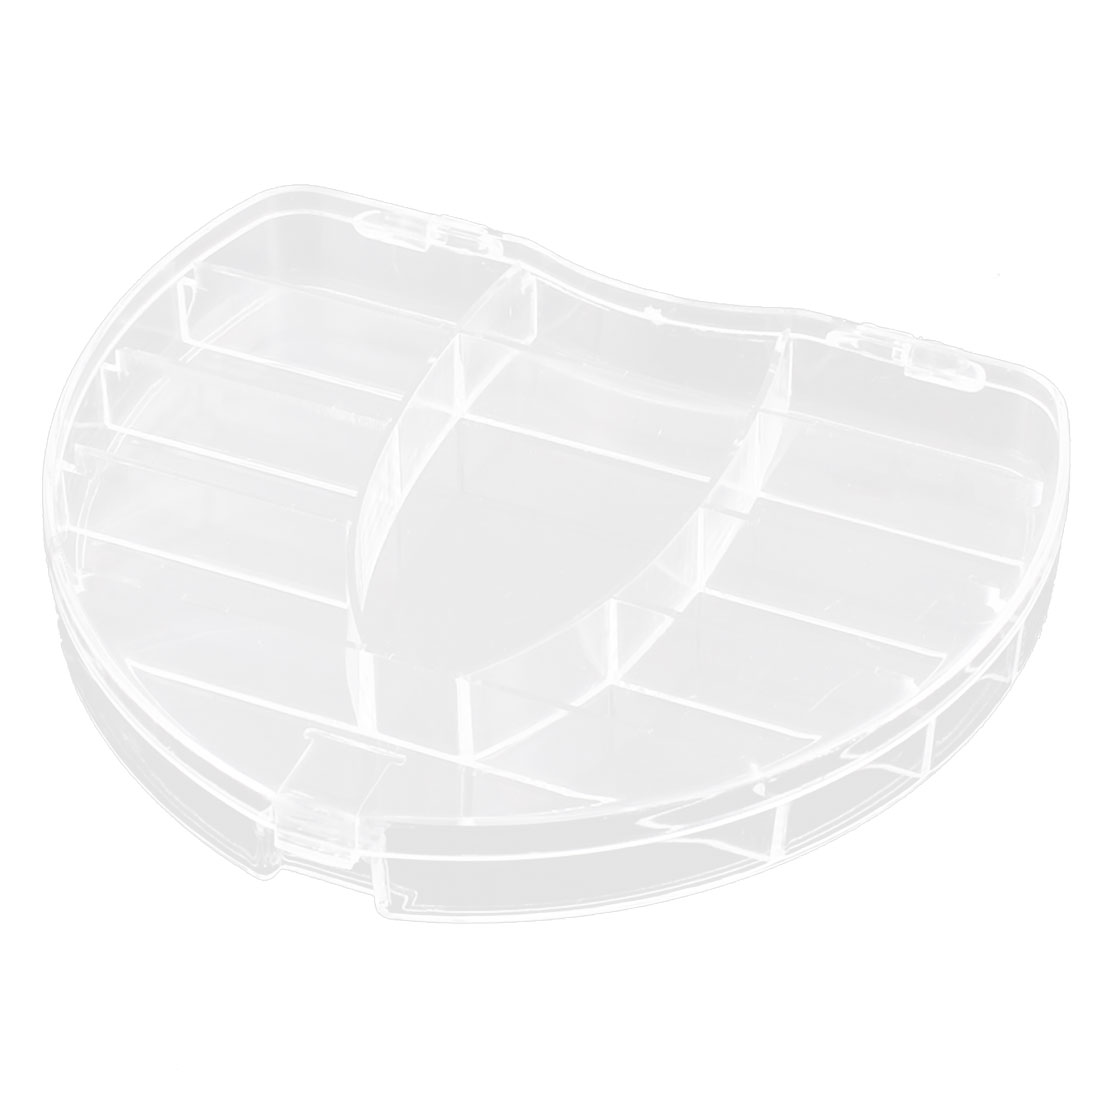 Fish Bait Cells Beads Plastic 11 Slots Transparent Storage Box Case Container